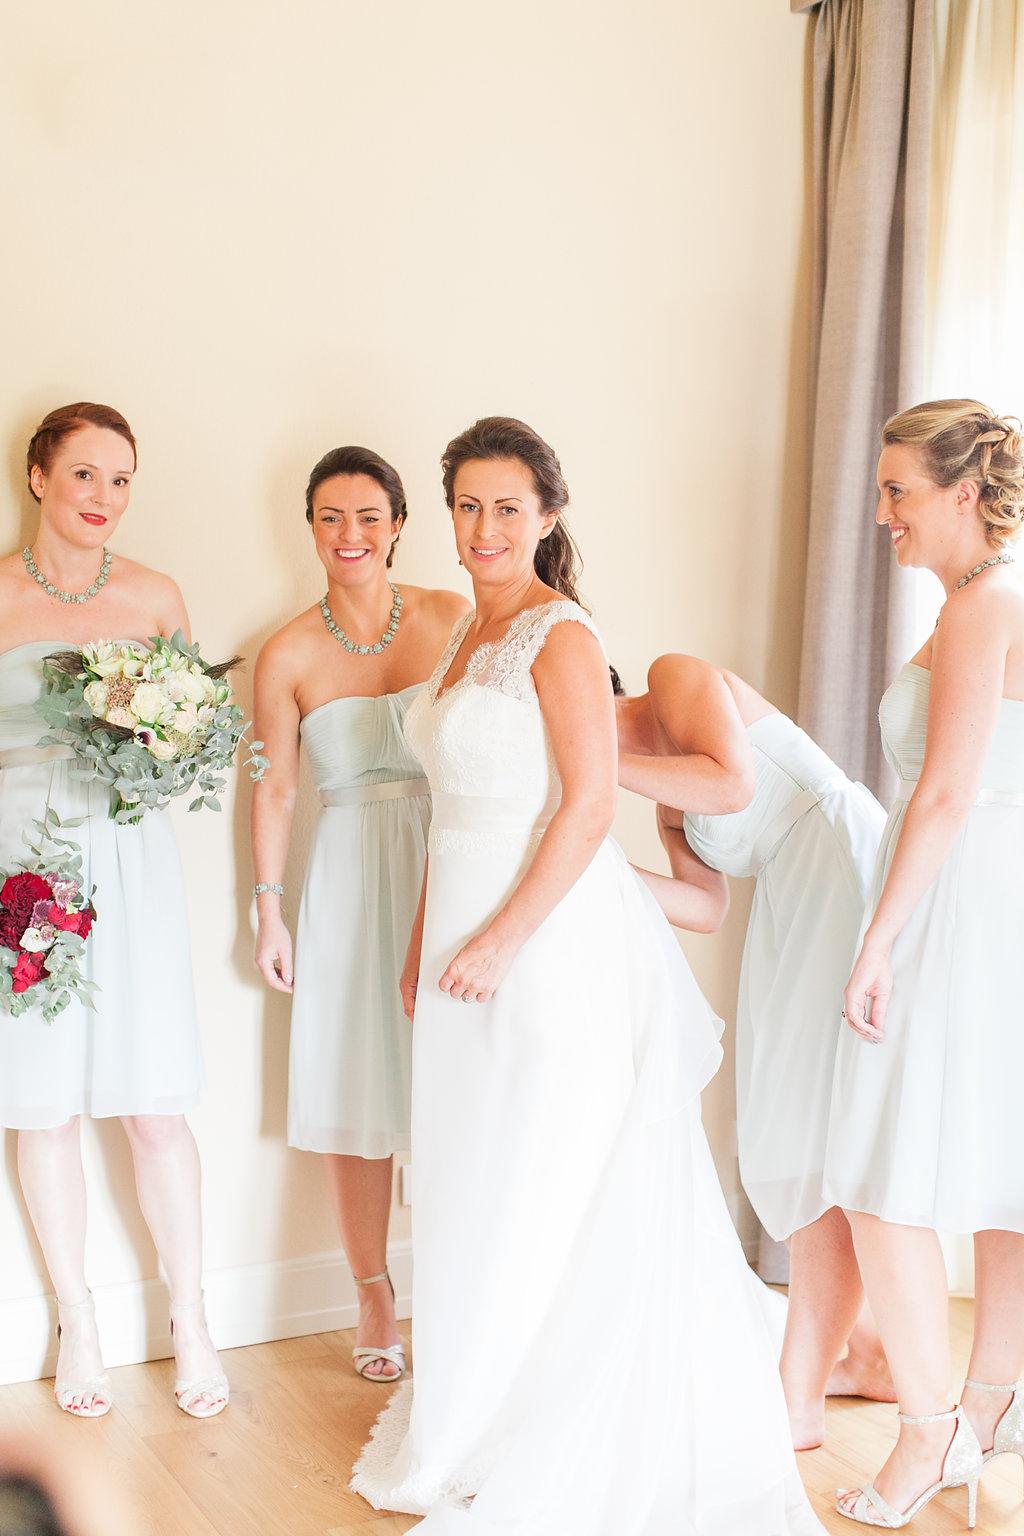 castelfalfi-tuscany-wedding-photographer-roberta-facchini-101